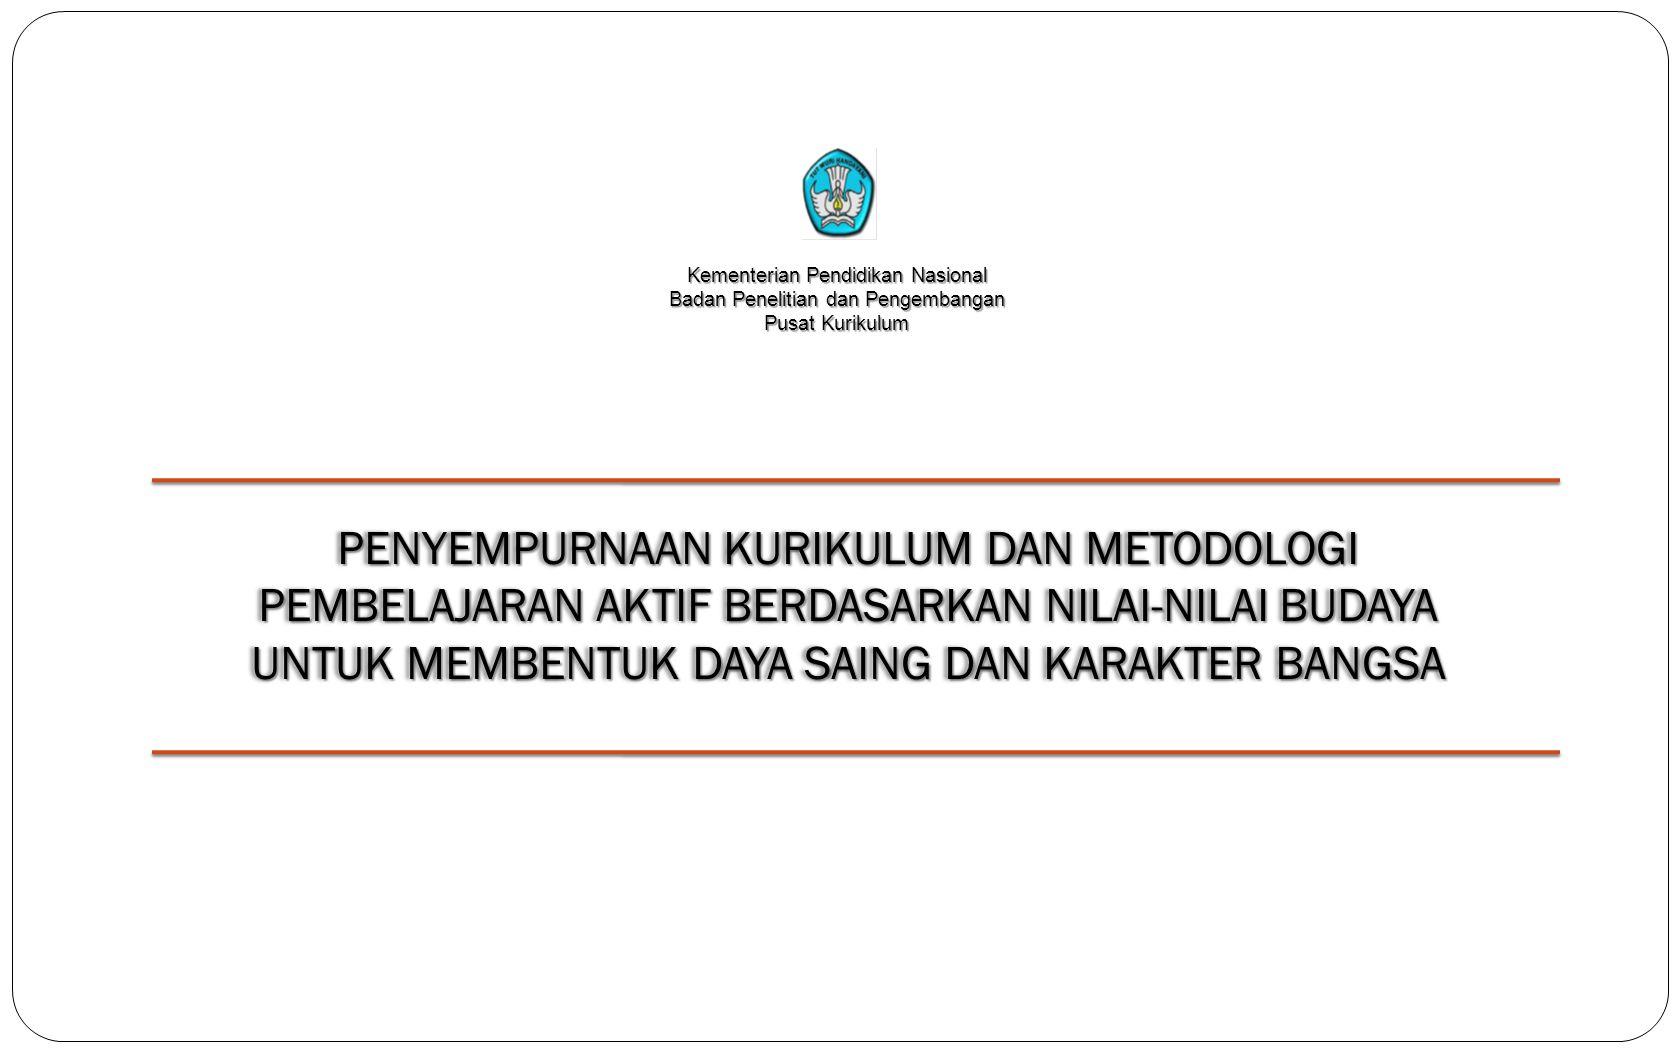 Kementerian Pendidikan Nasional Badan Penelitian dan Pengembangan Pusat Kurikulum PENYEMPURNAAN KURIKULUM DAN METODOLOGI PEMBELAJARAN AKTIF BERDASARKA